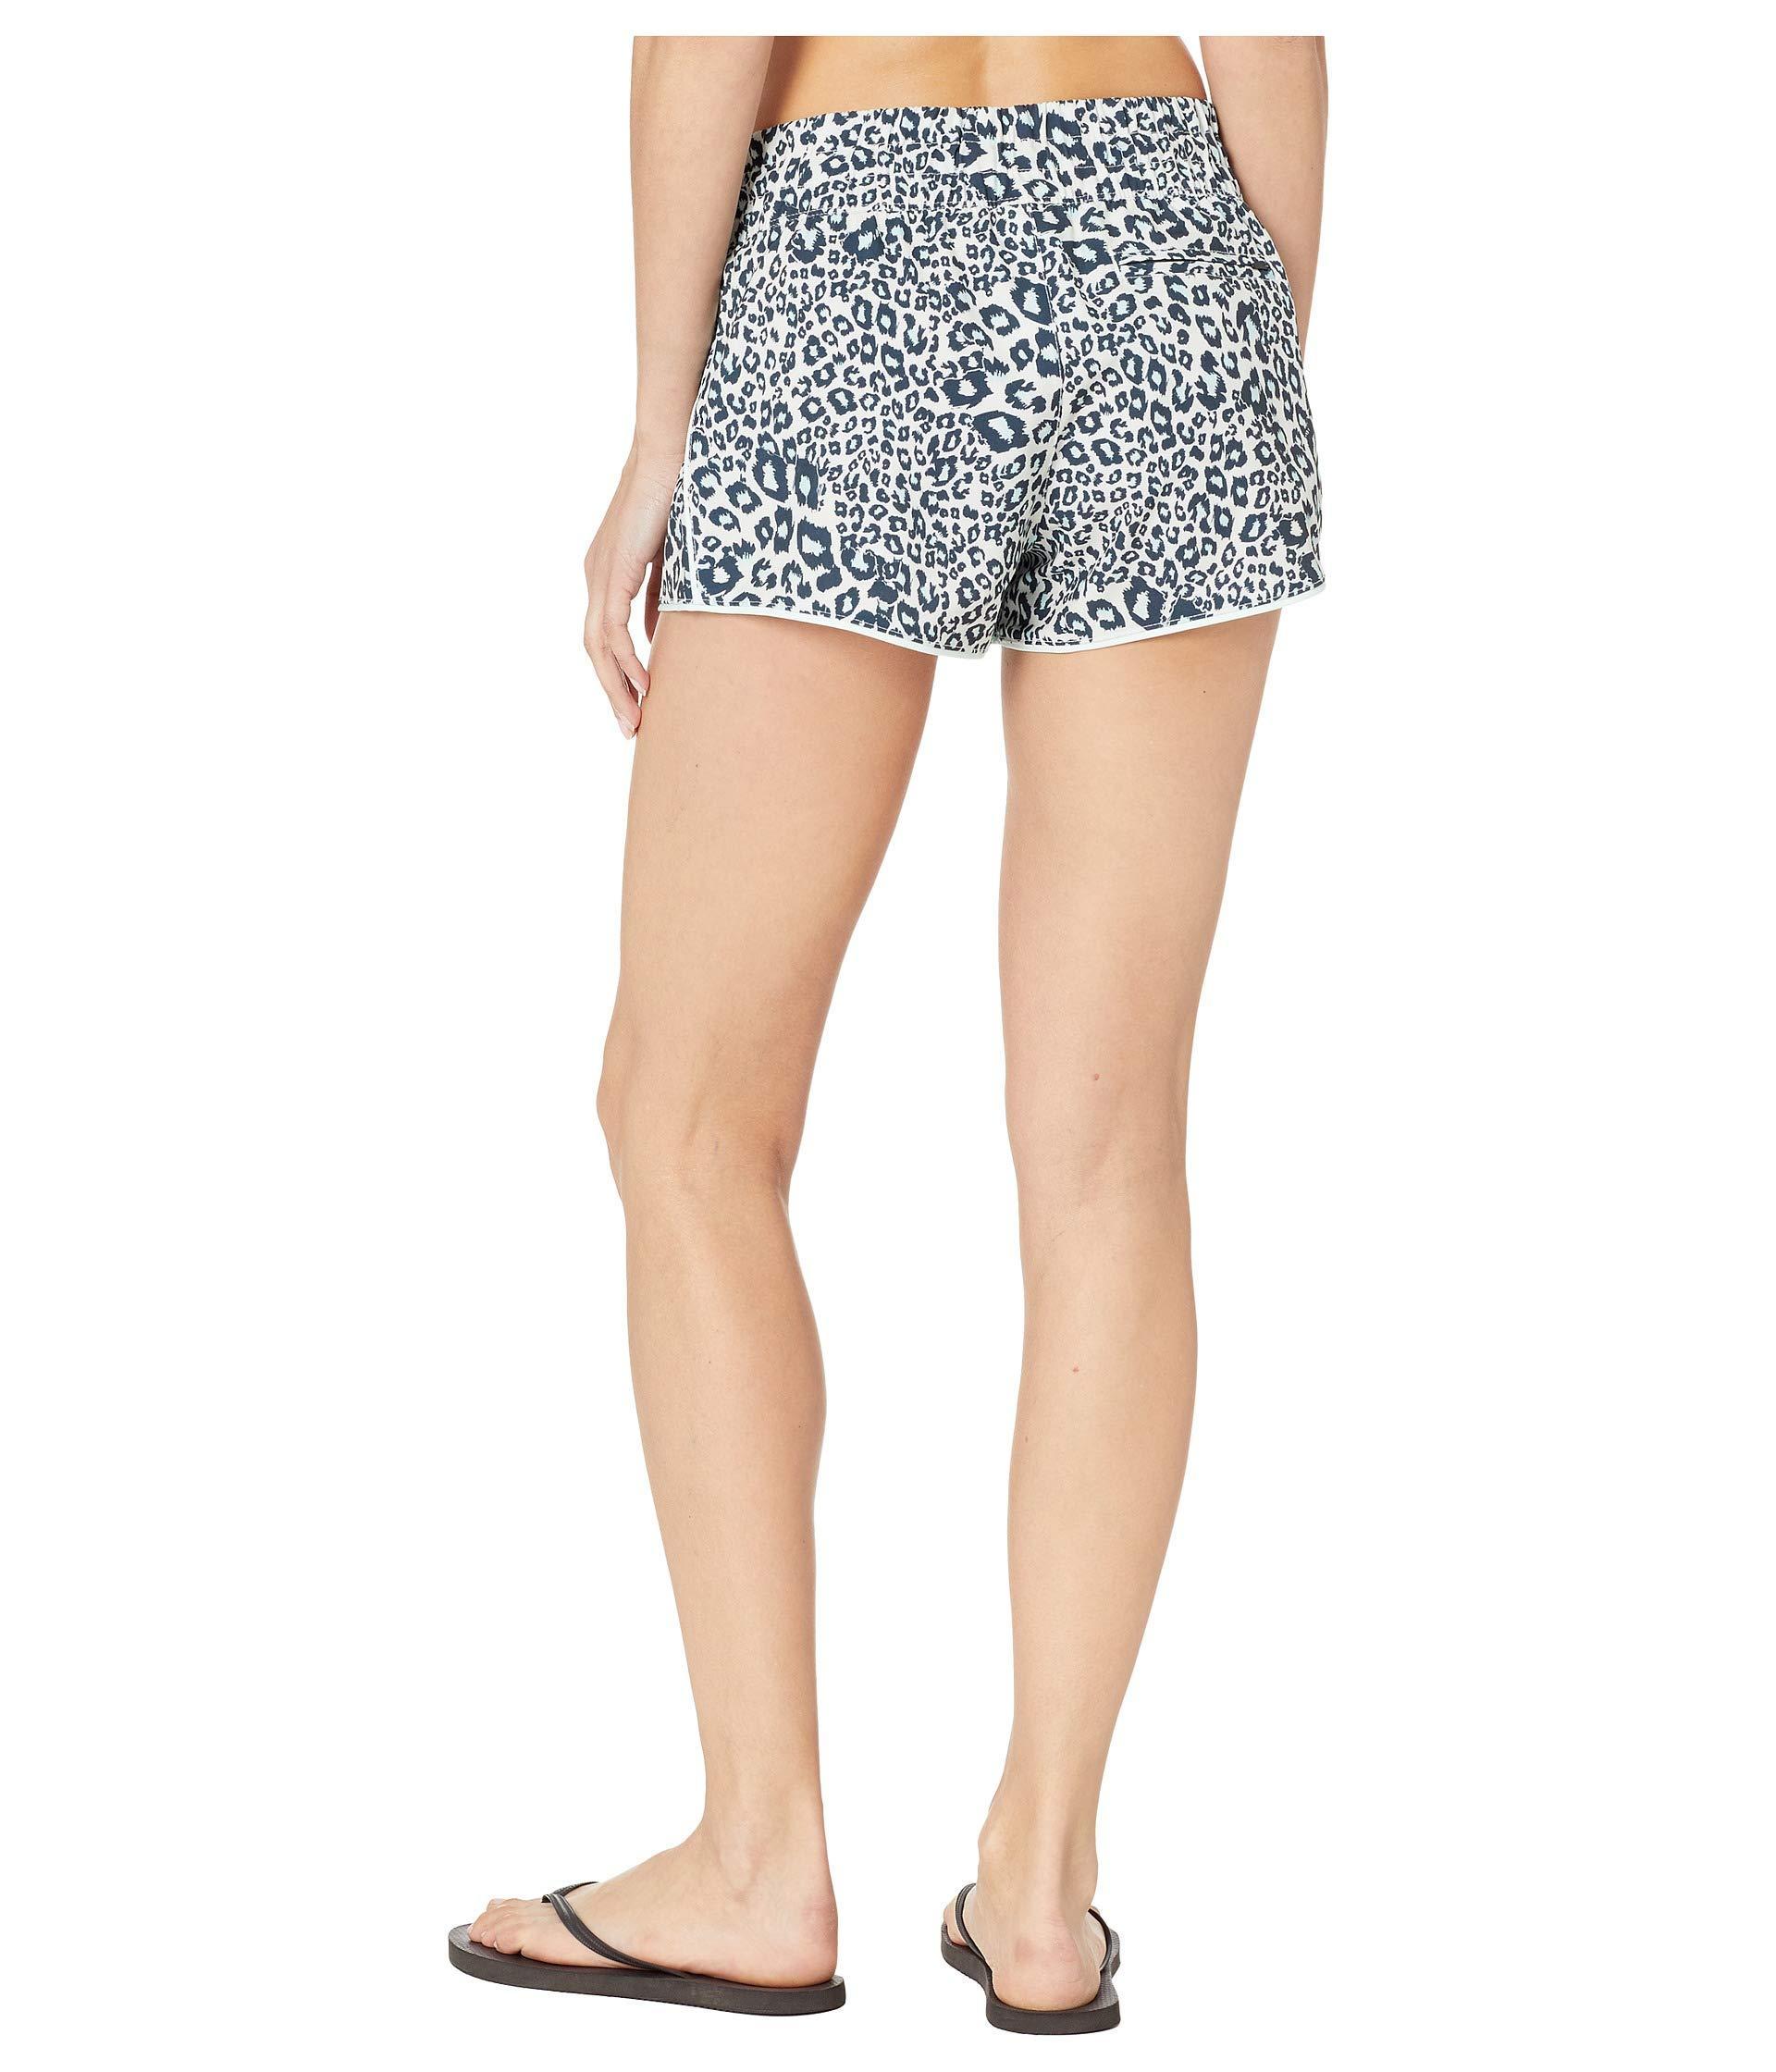 Womens Boardshorts Tartan Plaid Flowers Leopard Skin Animal Quick Dry Bathing Suits Mesh Lining Beach Board Shorts